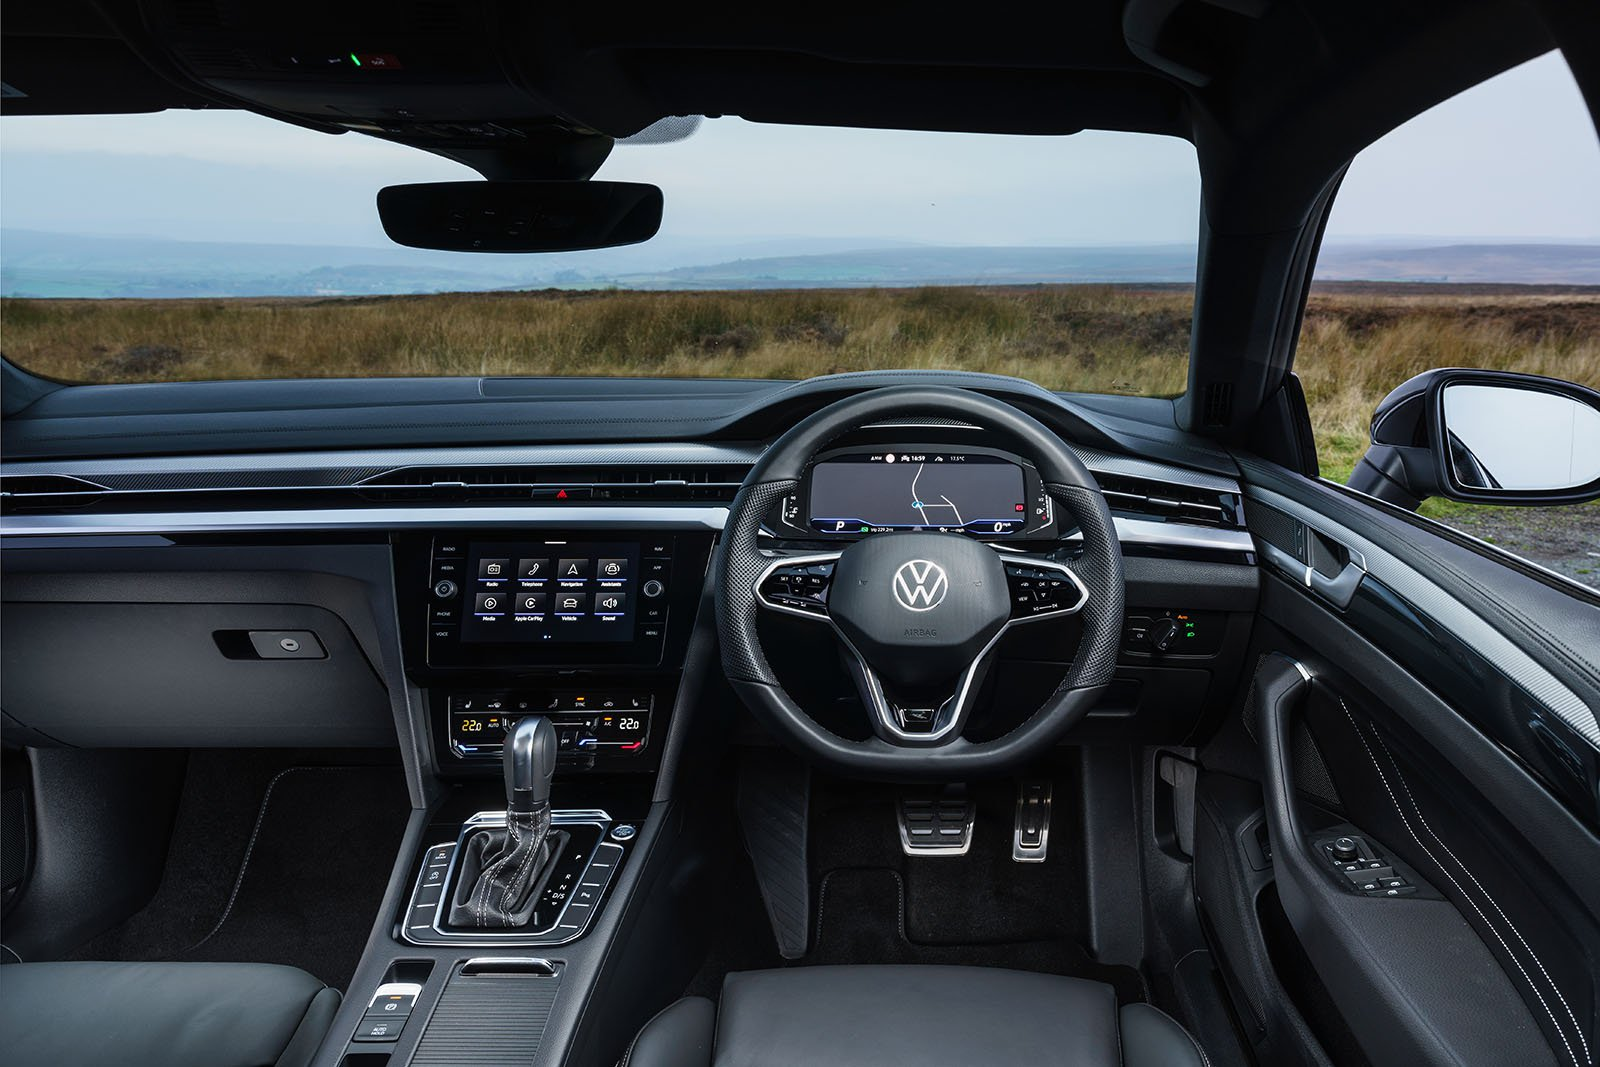 Volkswagen Arteon Gran Turismo 2020 Dashboard